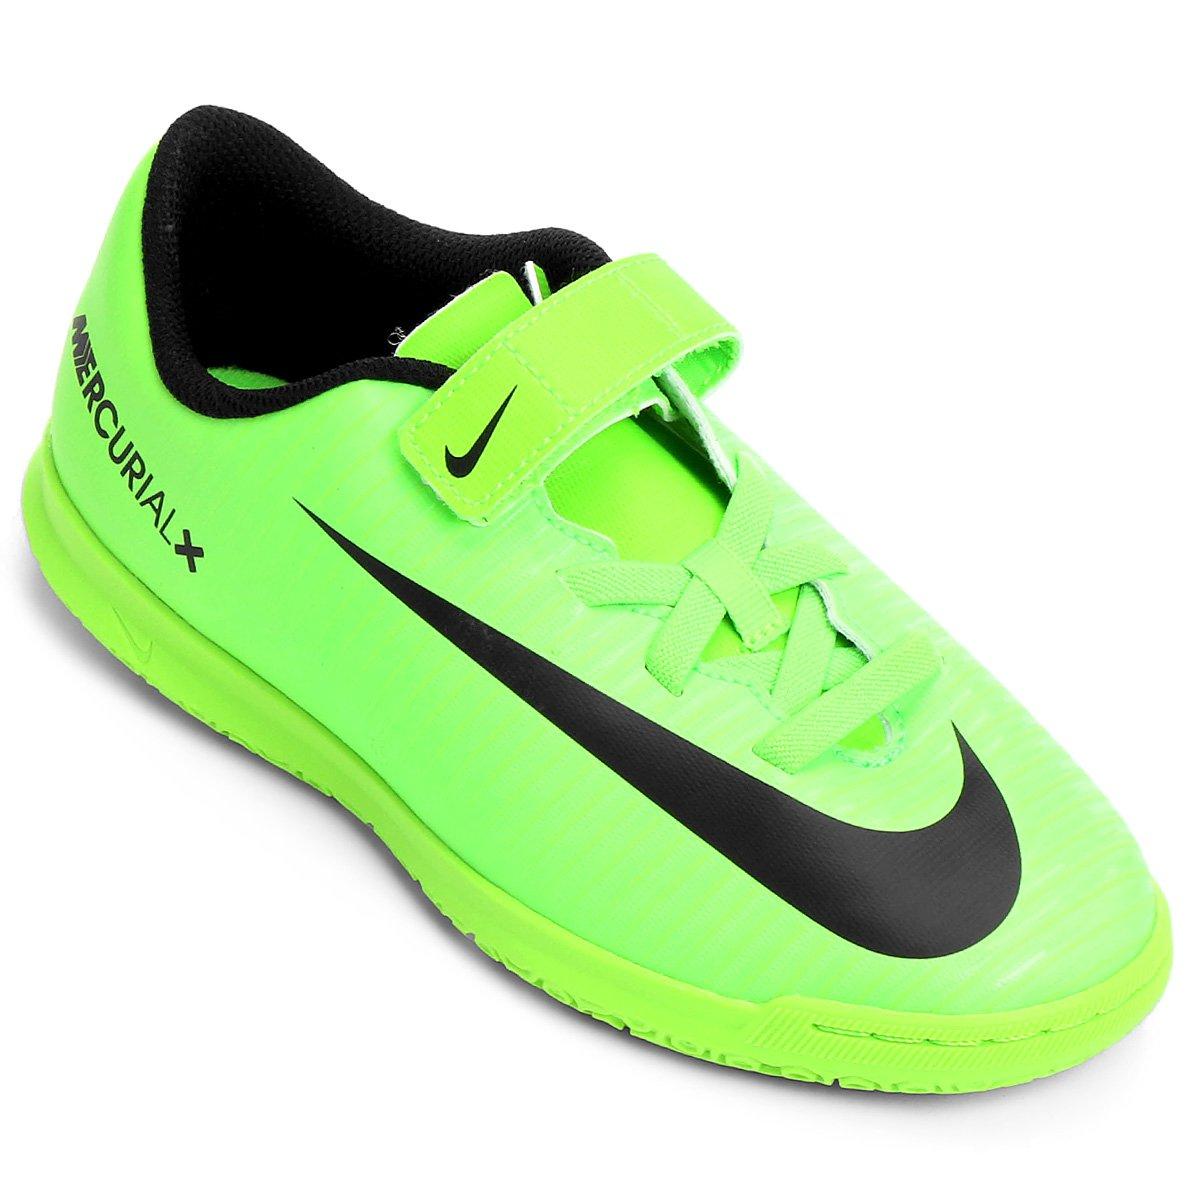 Chuteira Futsal Infantil Nike Mercurial Vortex 3 IC - Compre Agora ... 2a9d3c801d561